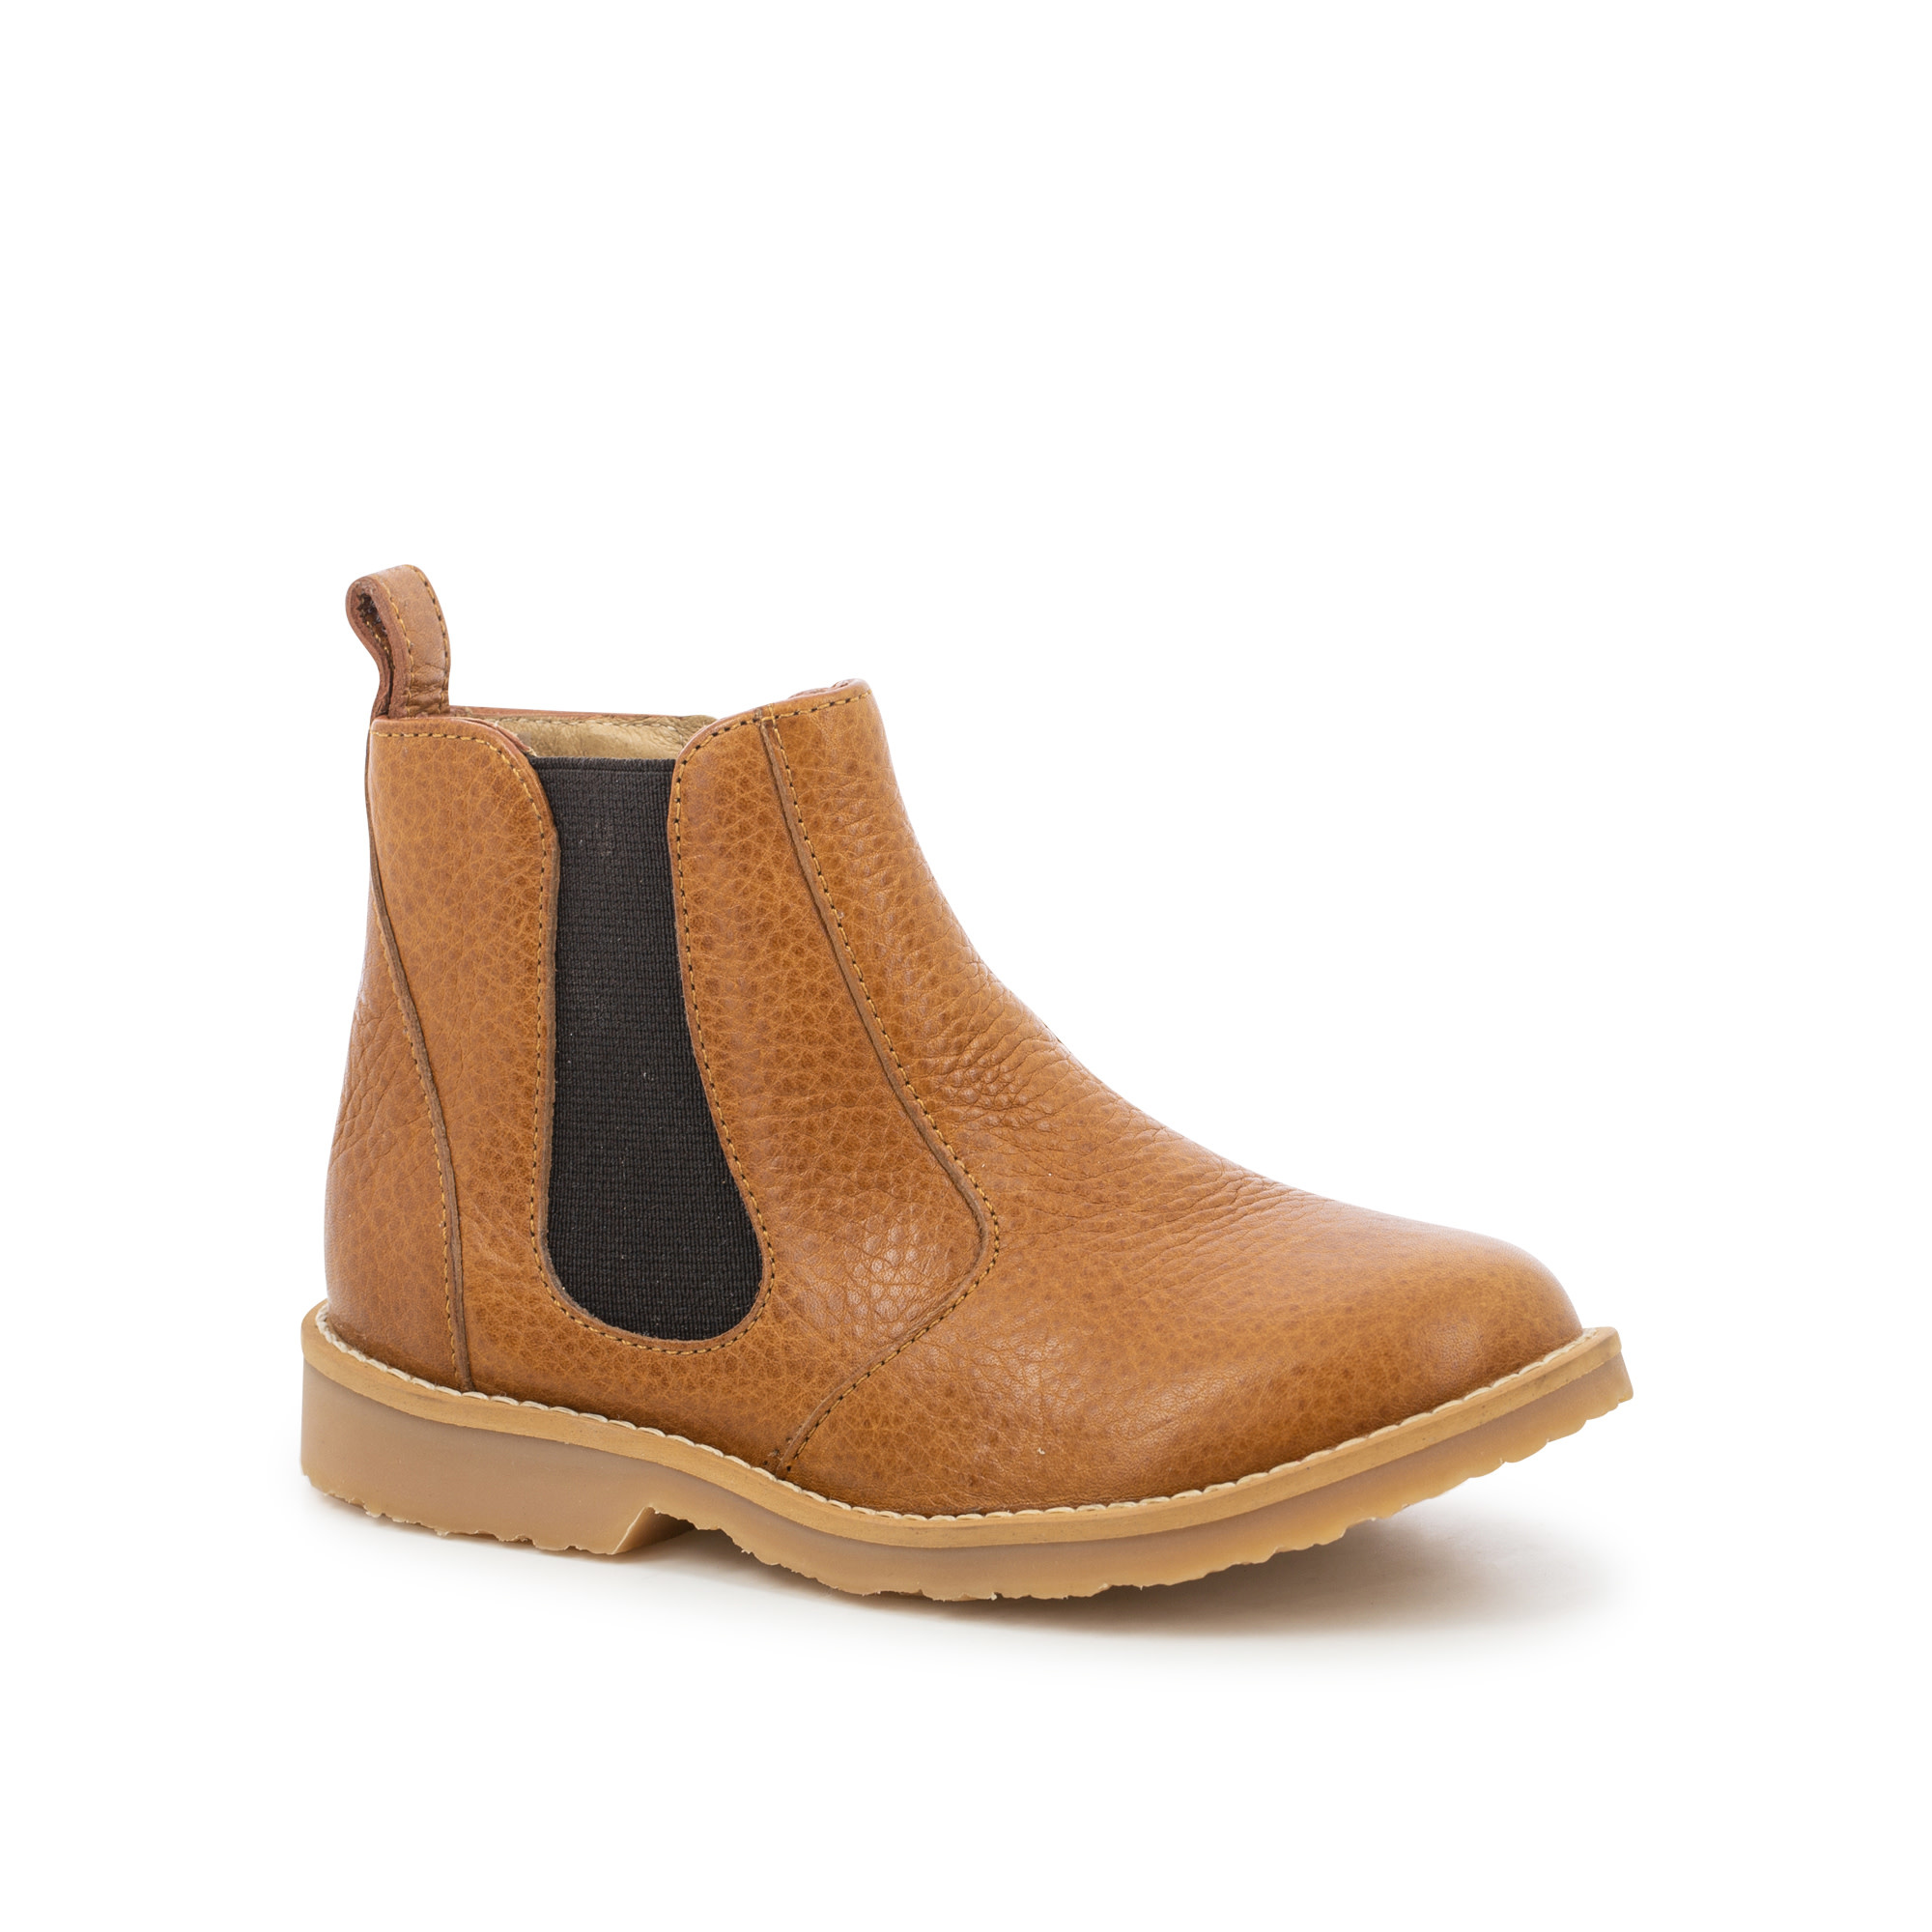 Pom d'Api Atlas Zip Boots